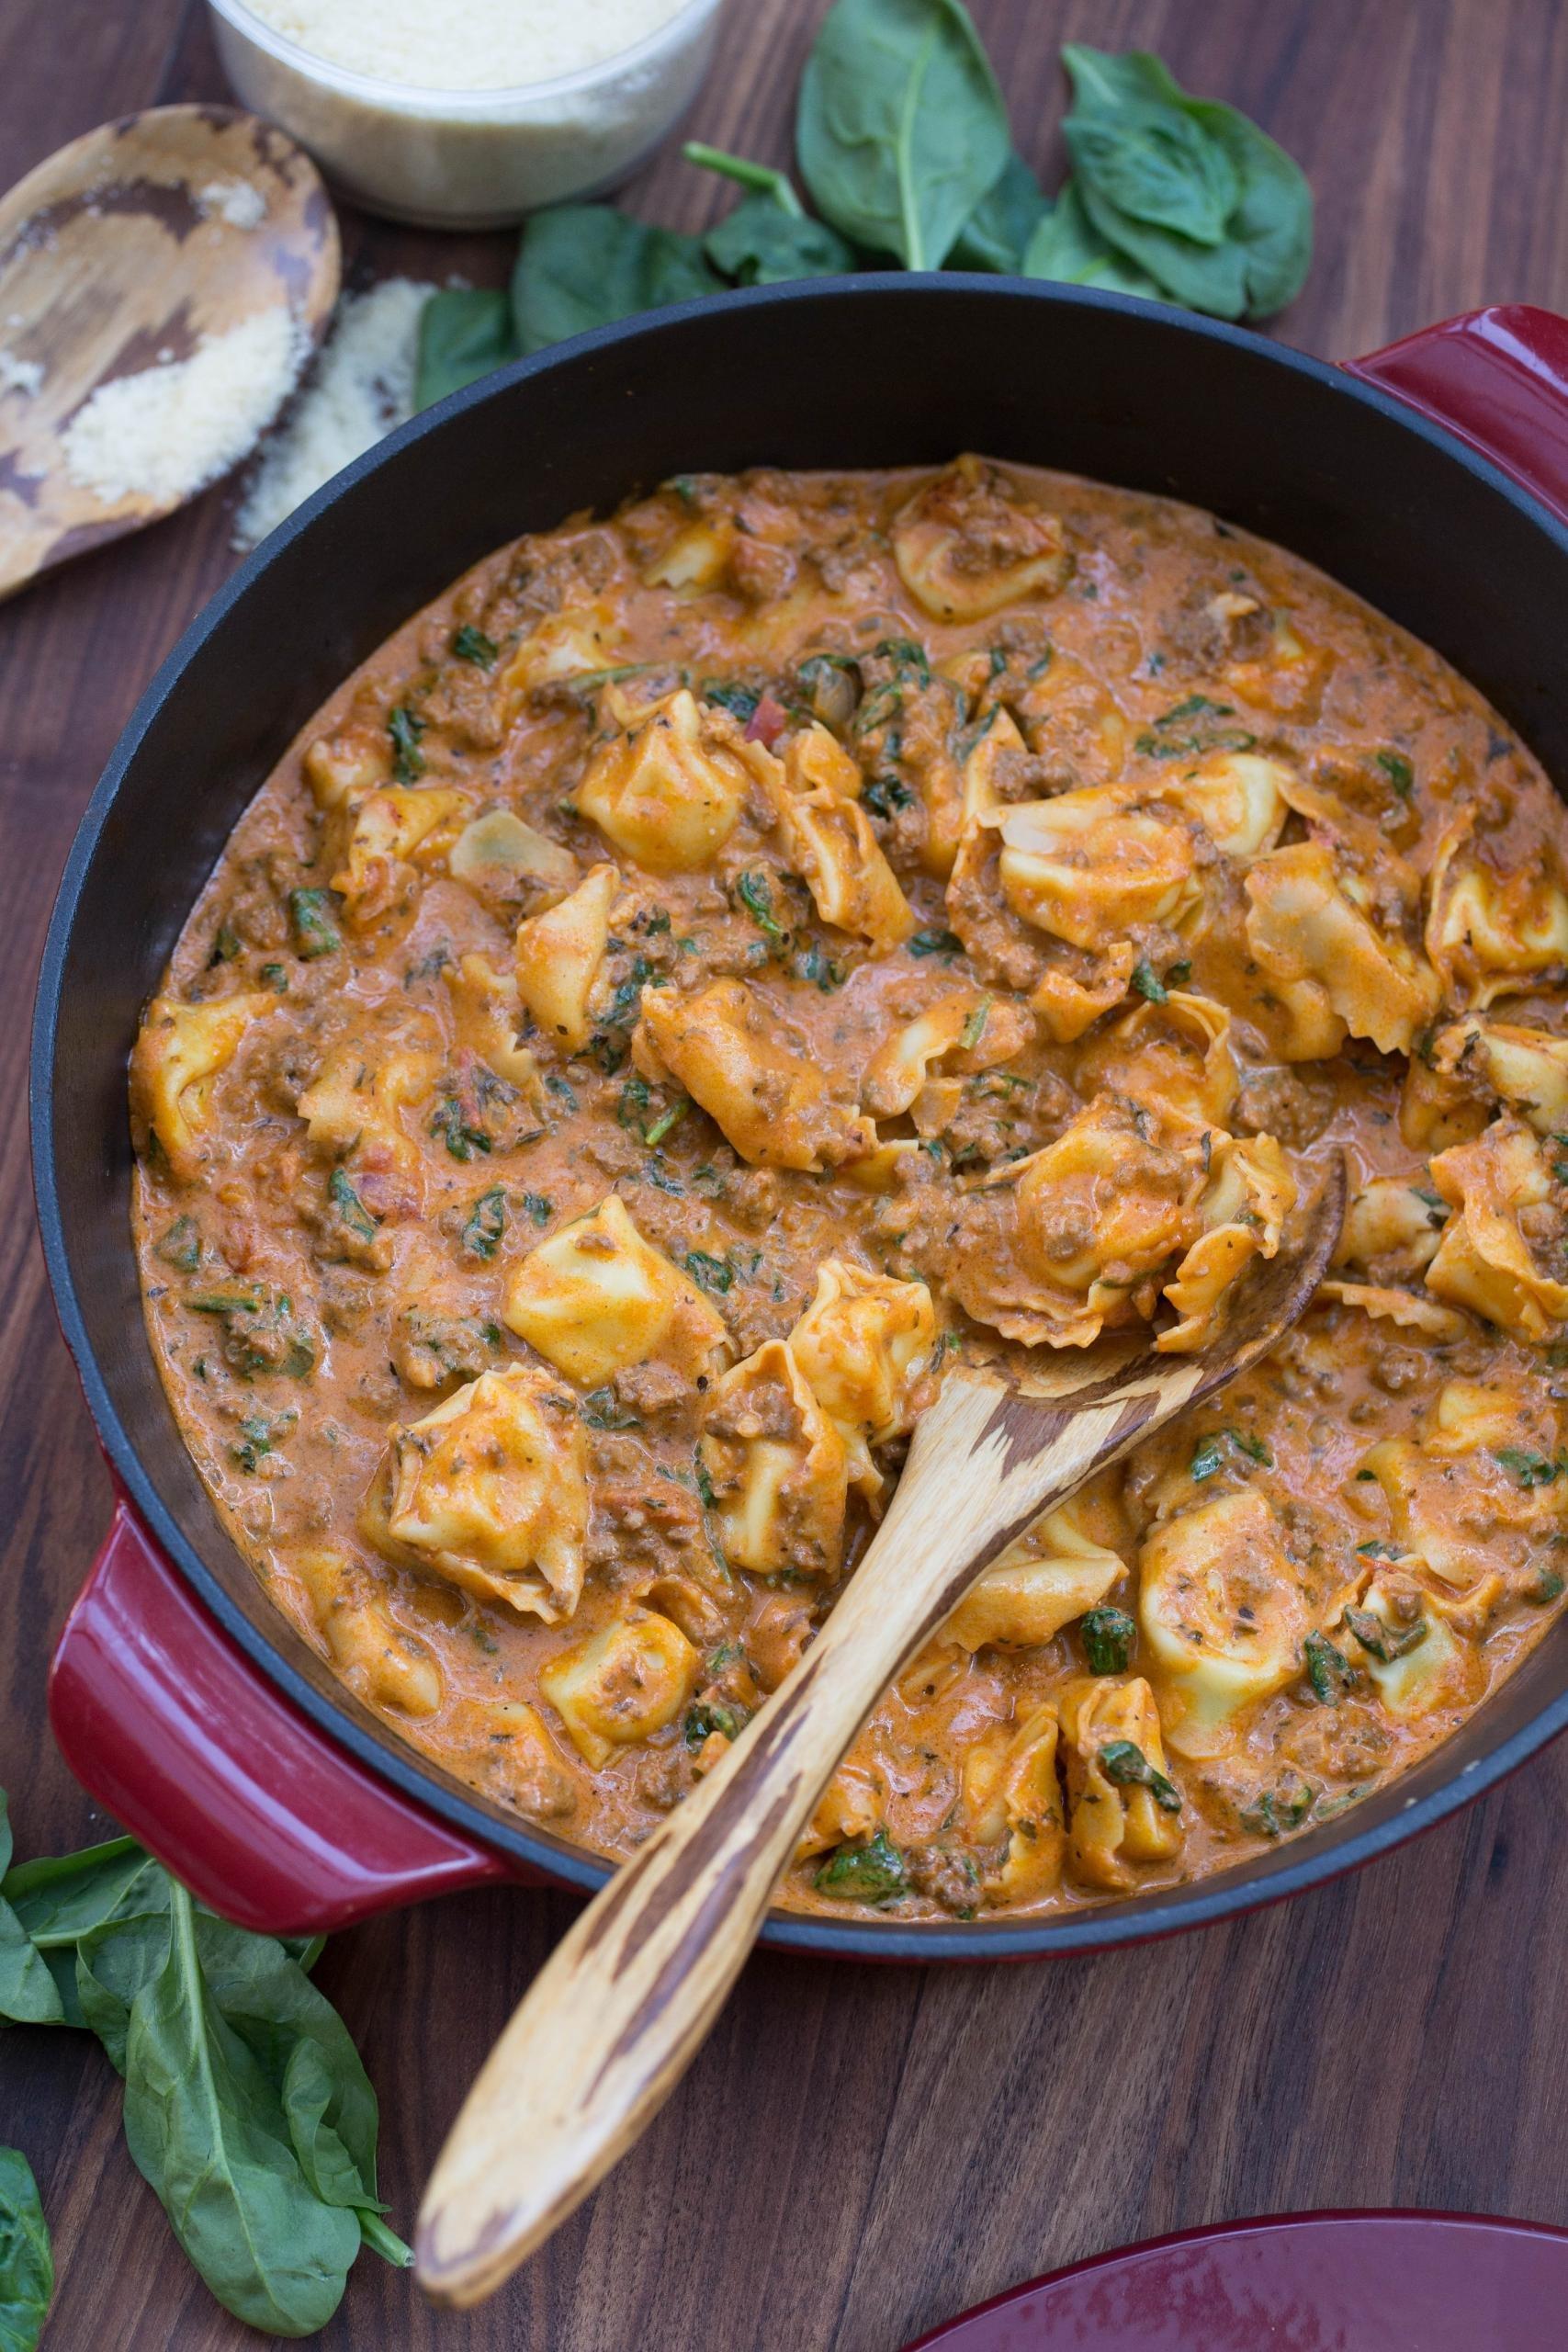 Creamy Spinach Tomato Tortellini in a ceramic baking pan